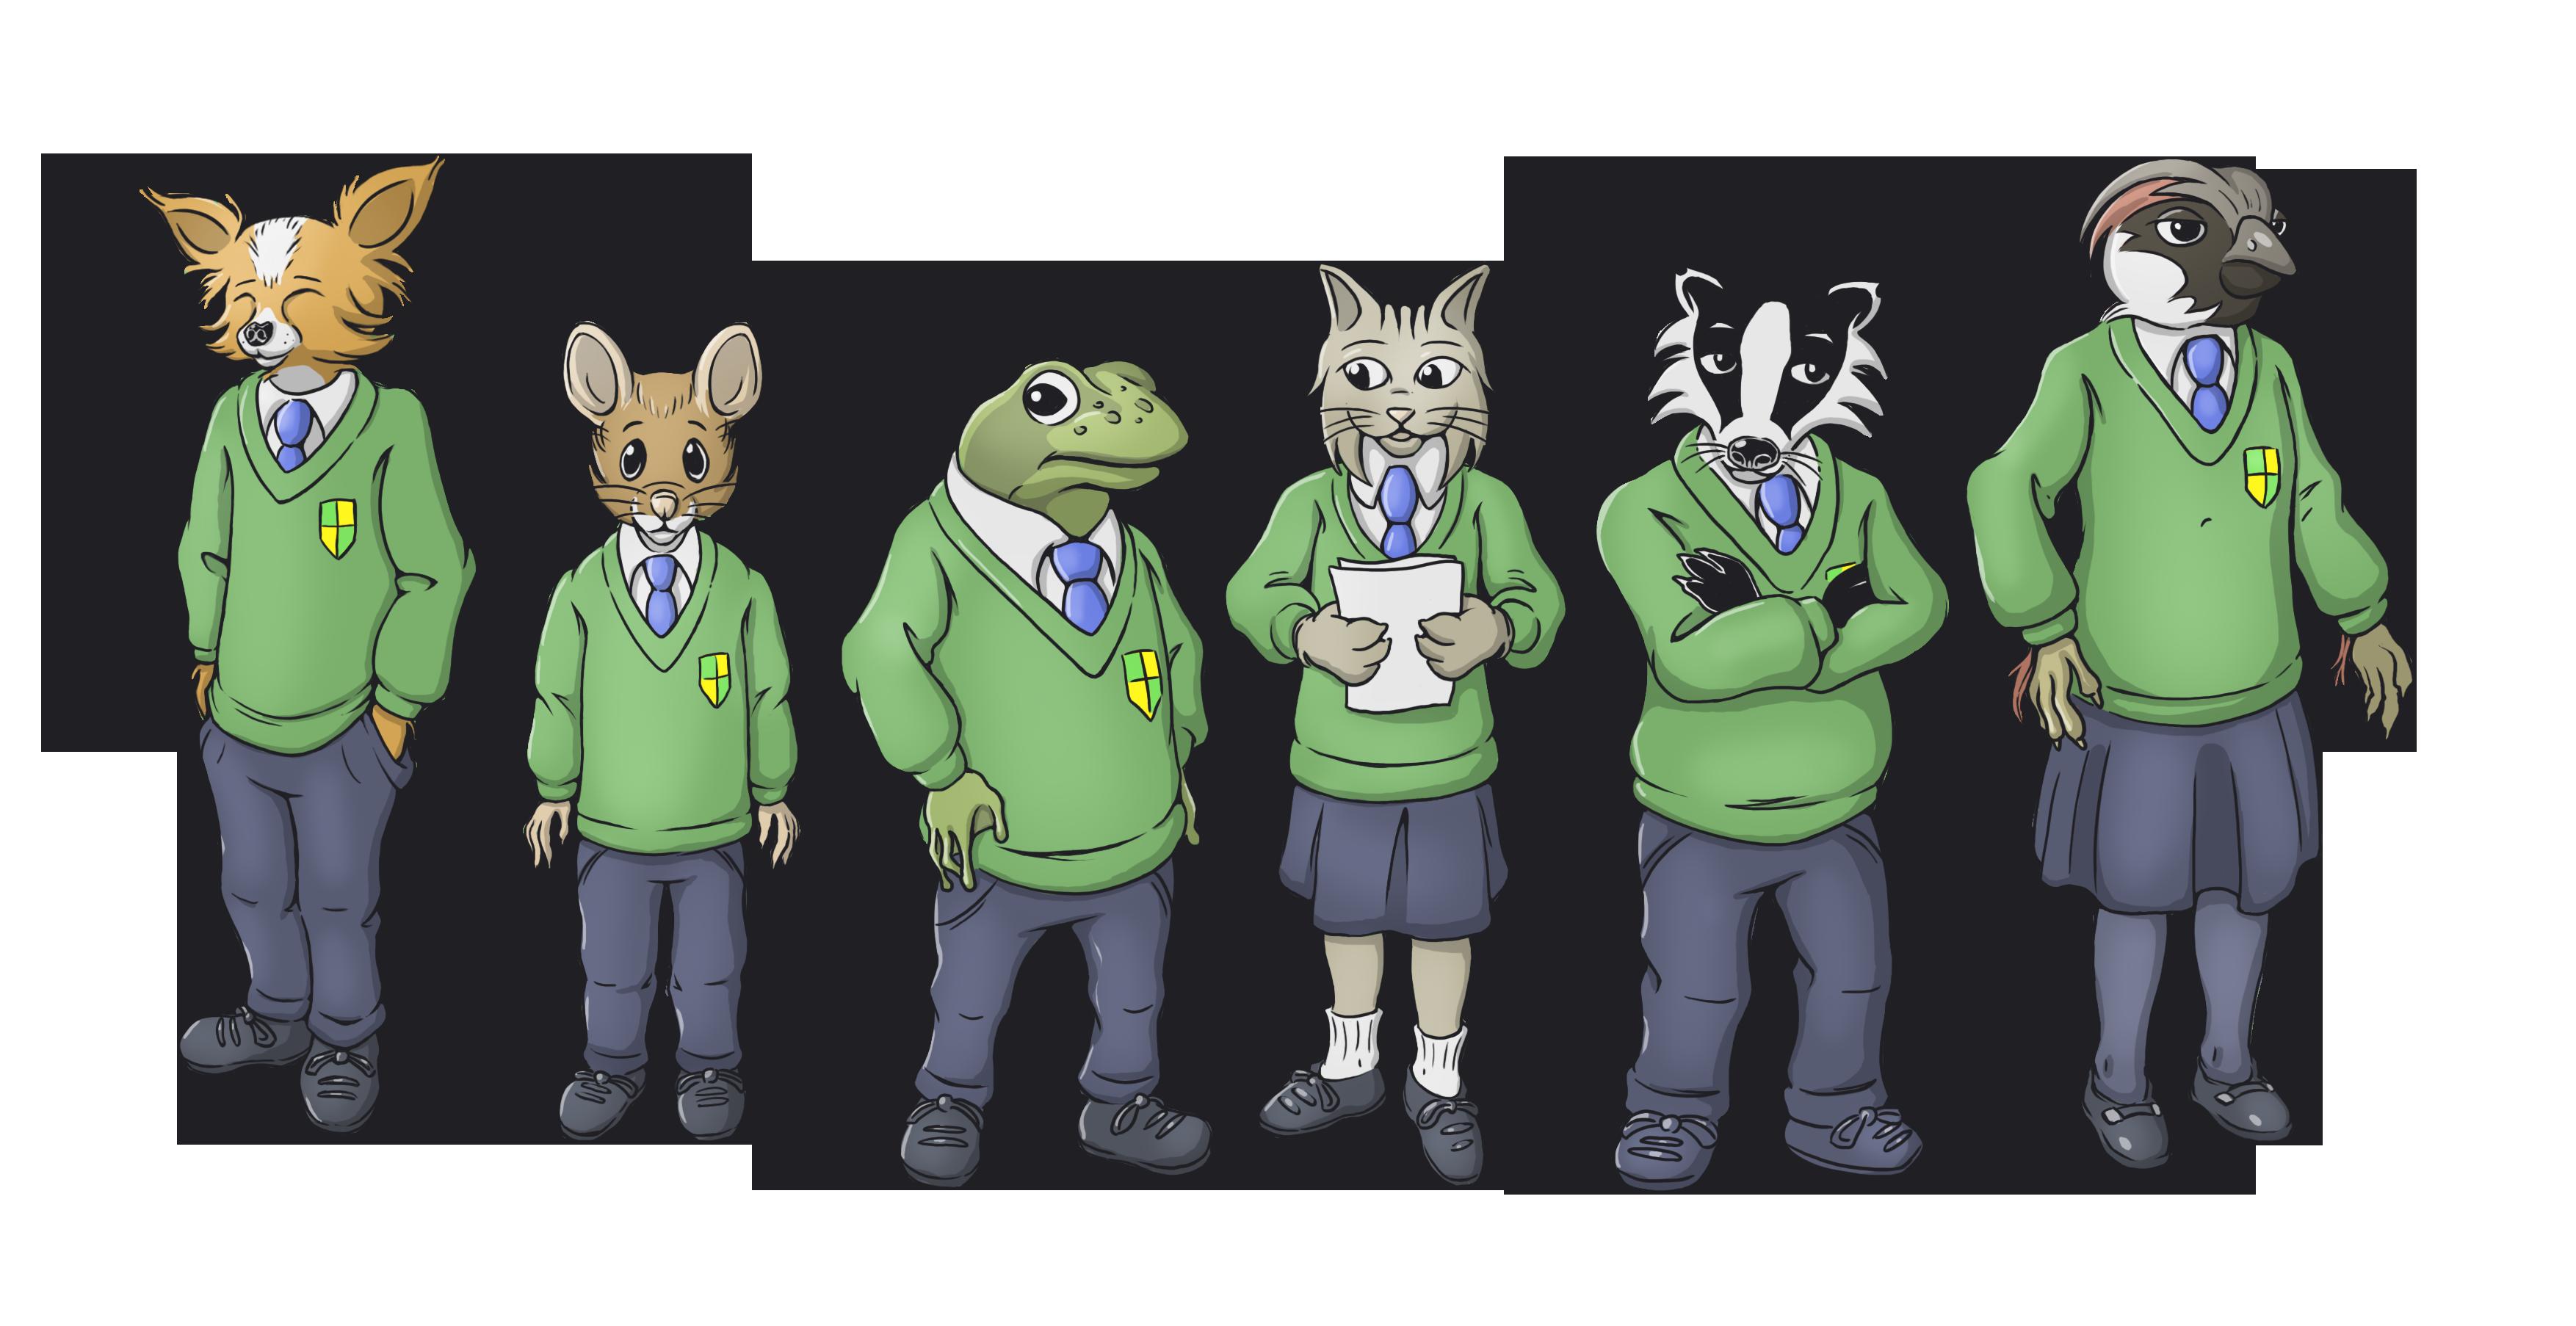 Illustration of six students